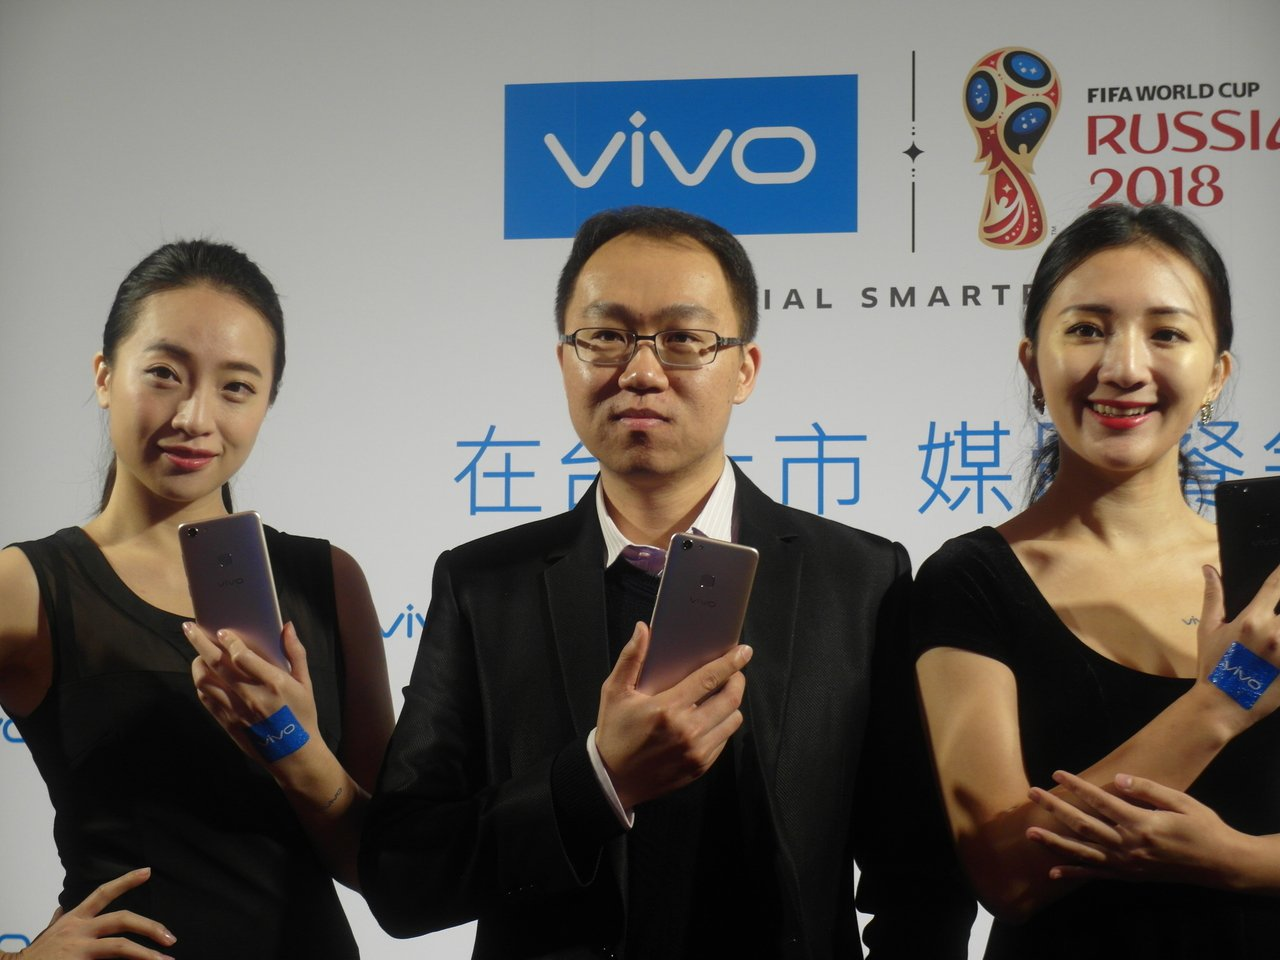 vivo台灣分公司副總經理韋奇夆(中)。 記者何佩儒/攝影